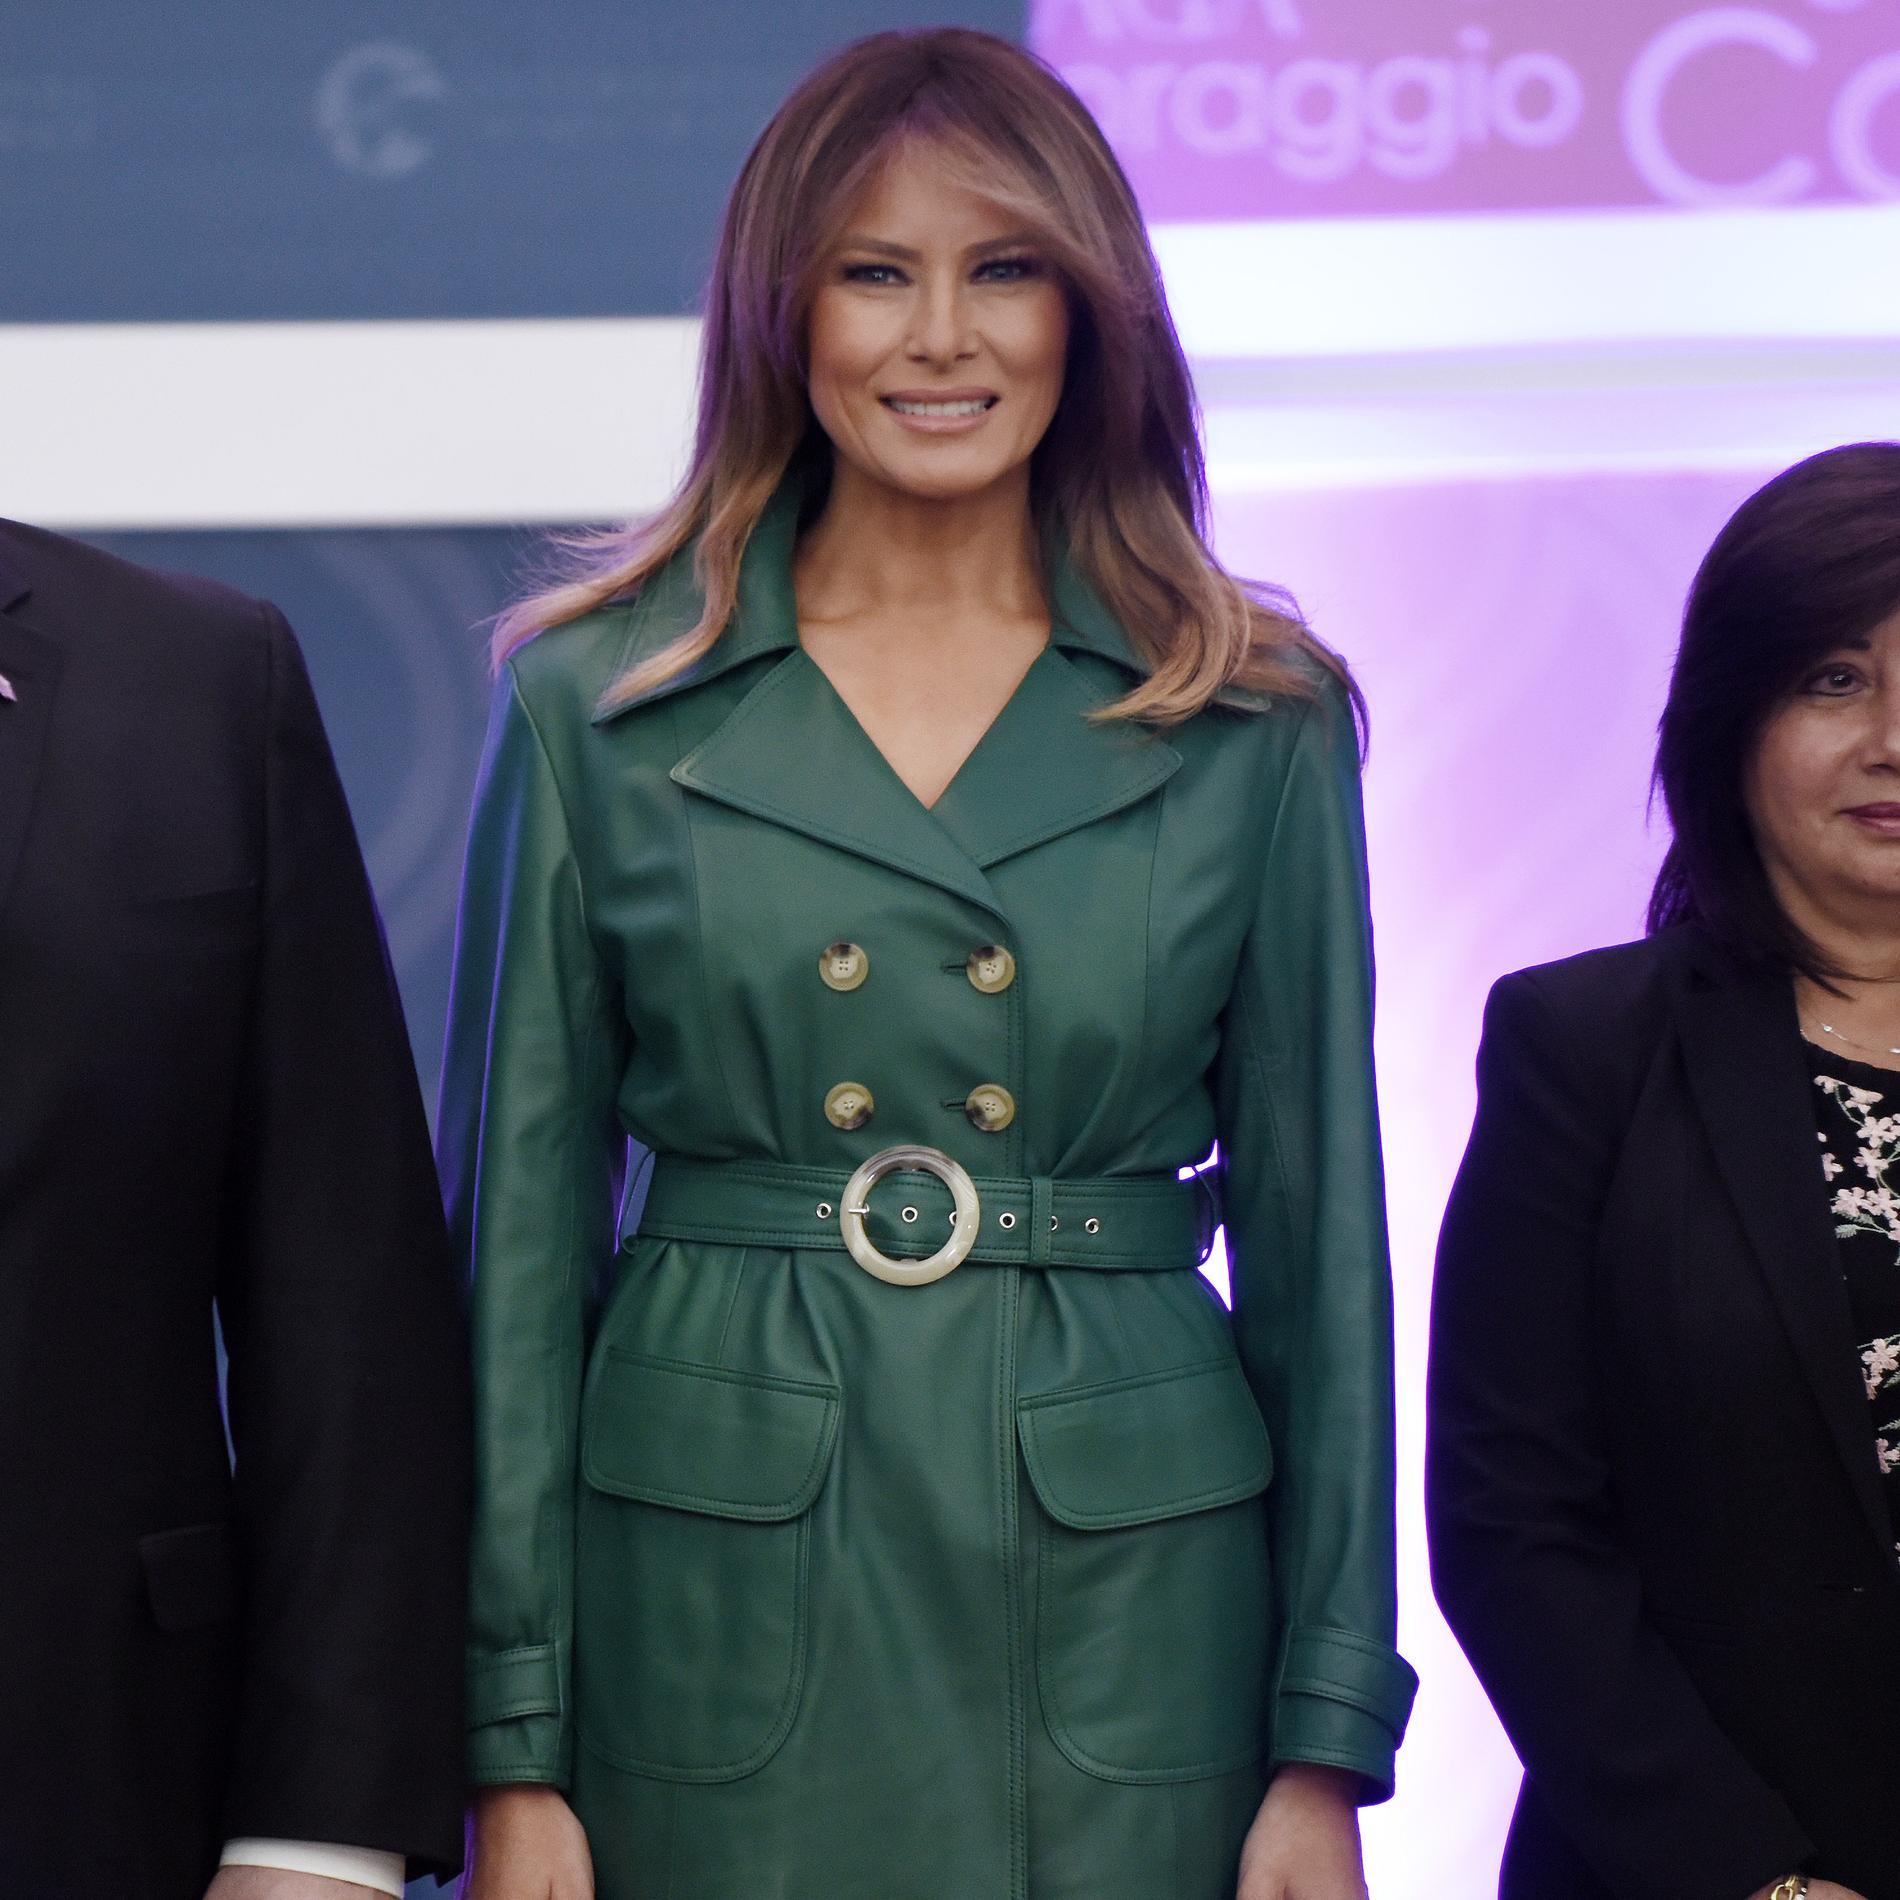 Melania Trump en manteau vert